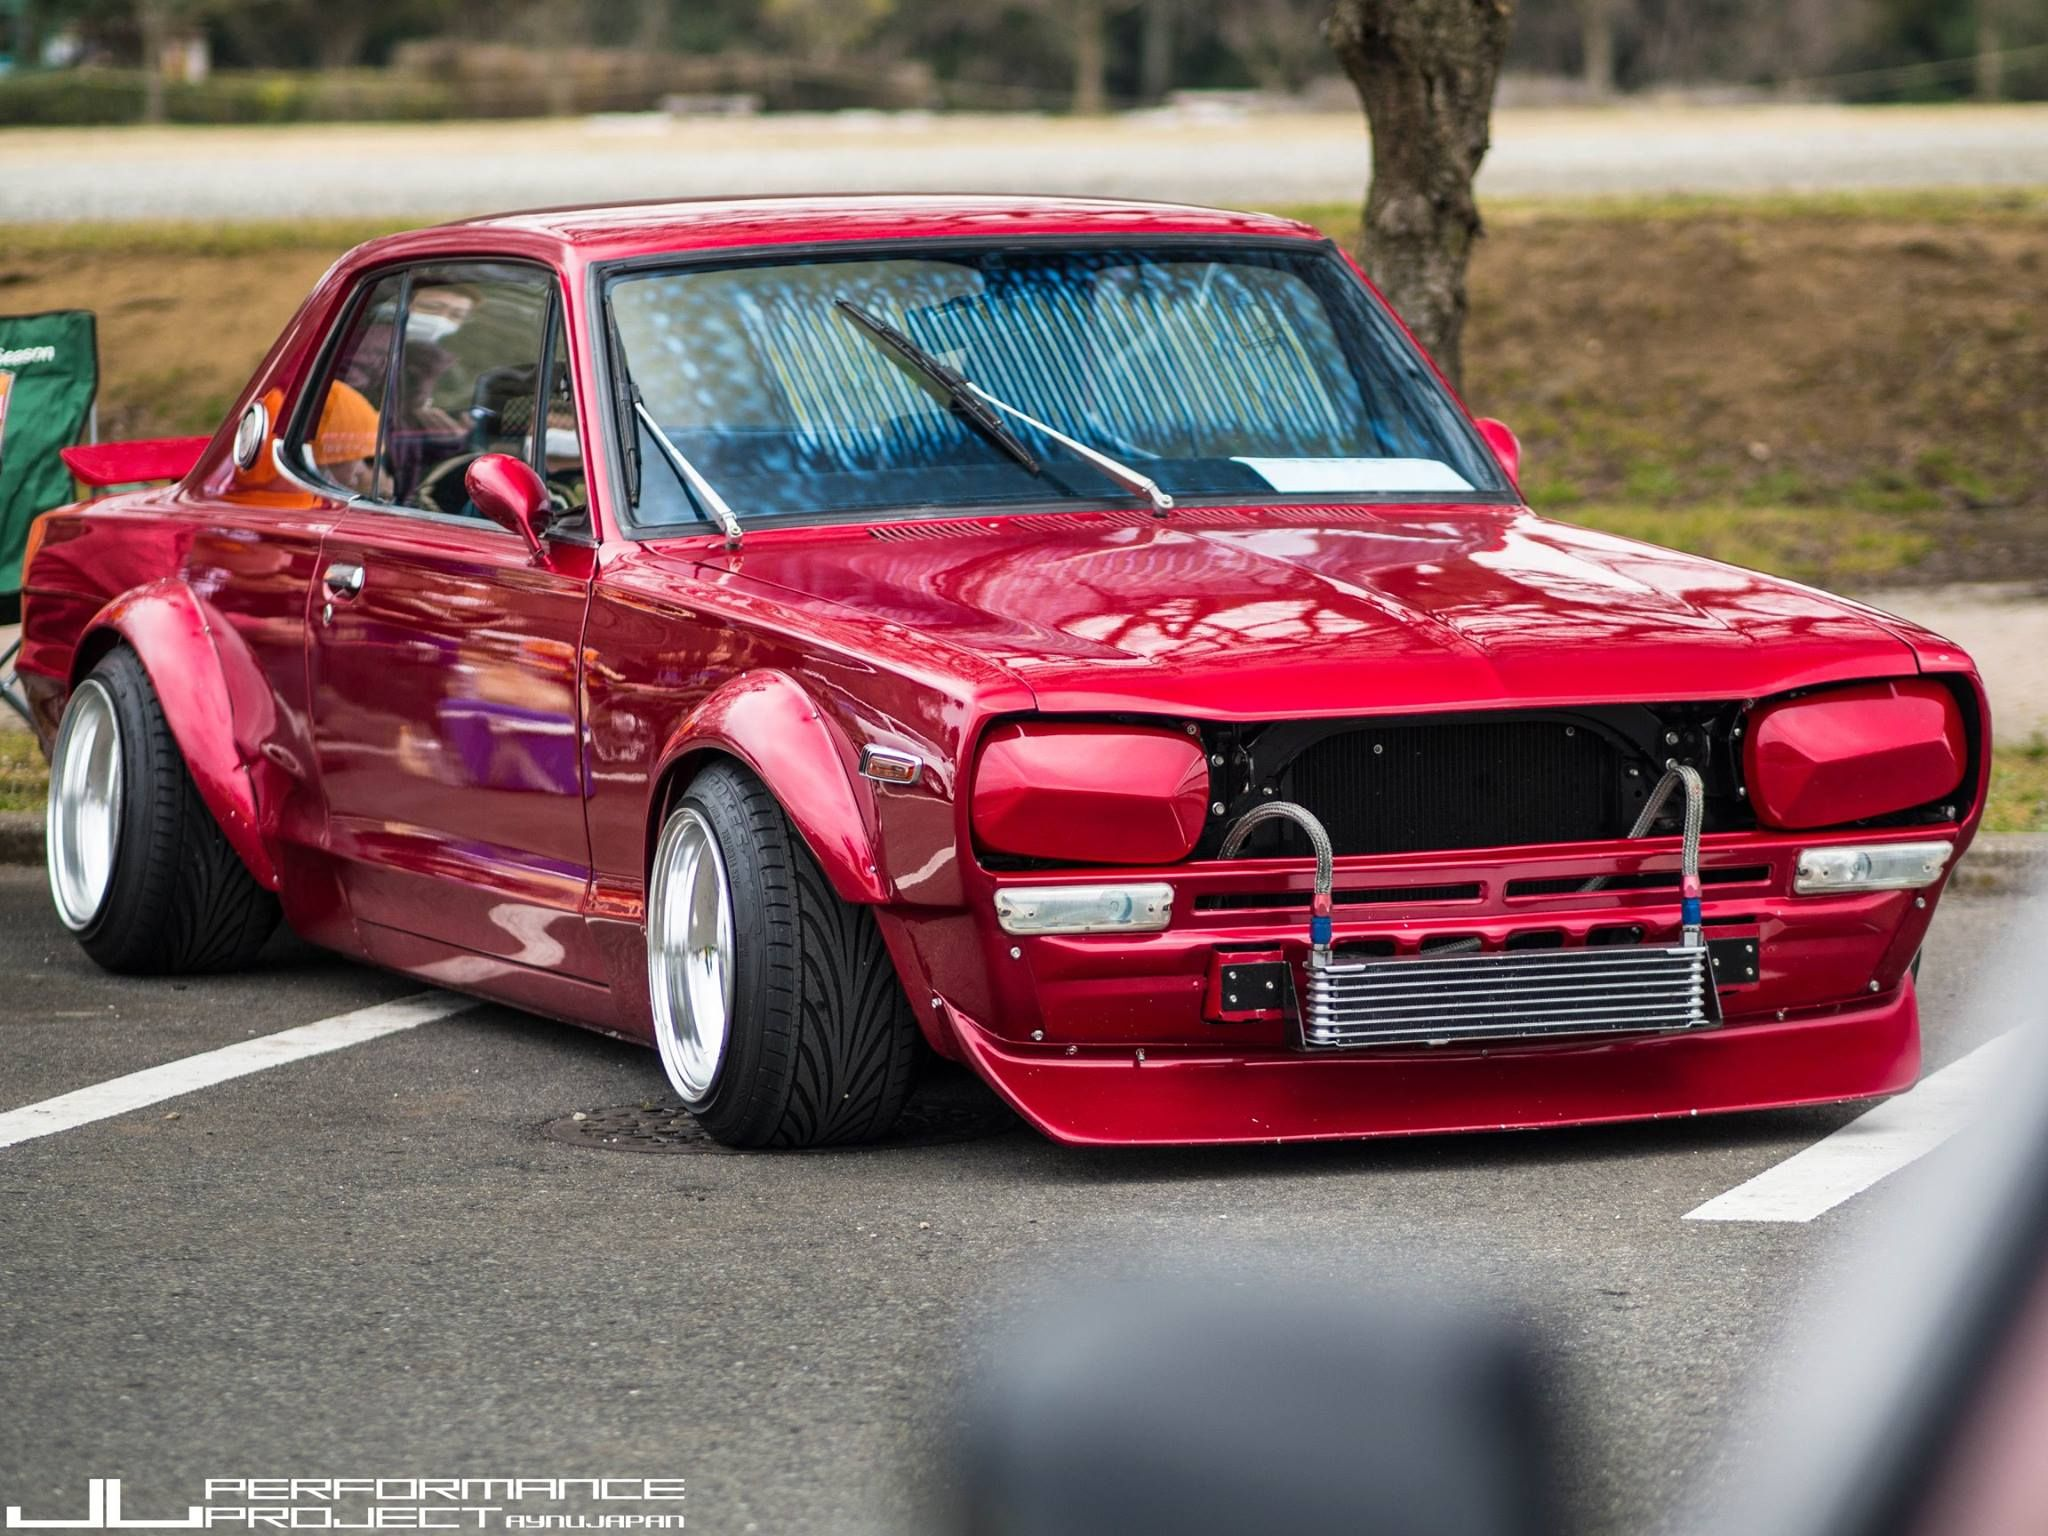 Kyusha style Hakosuka | Nissan | Pinterest | Cars, Jdm and ...